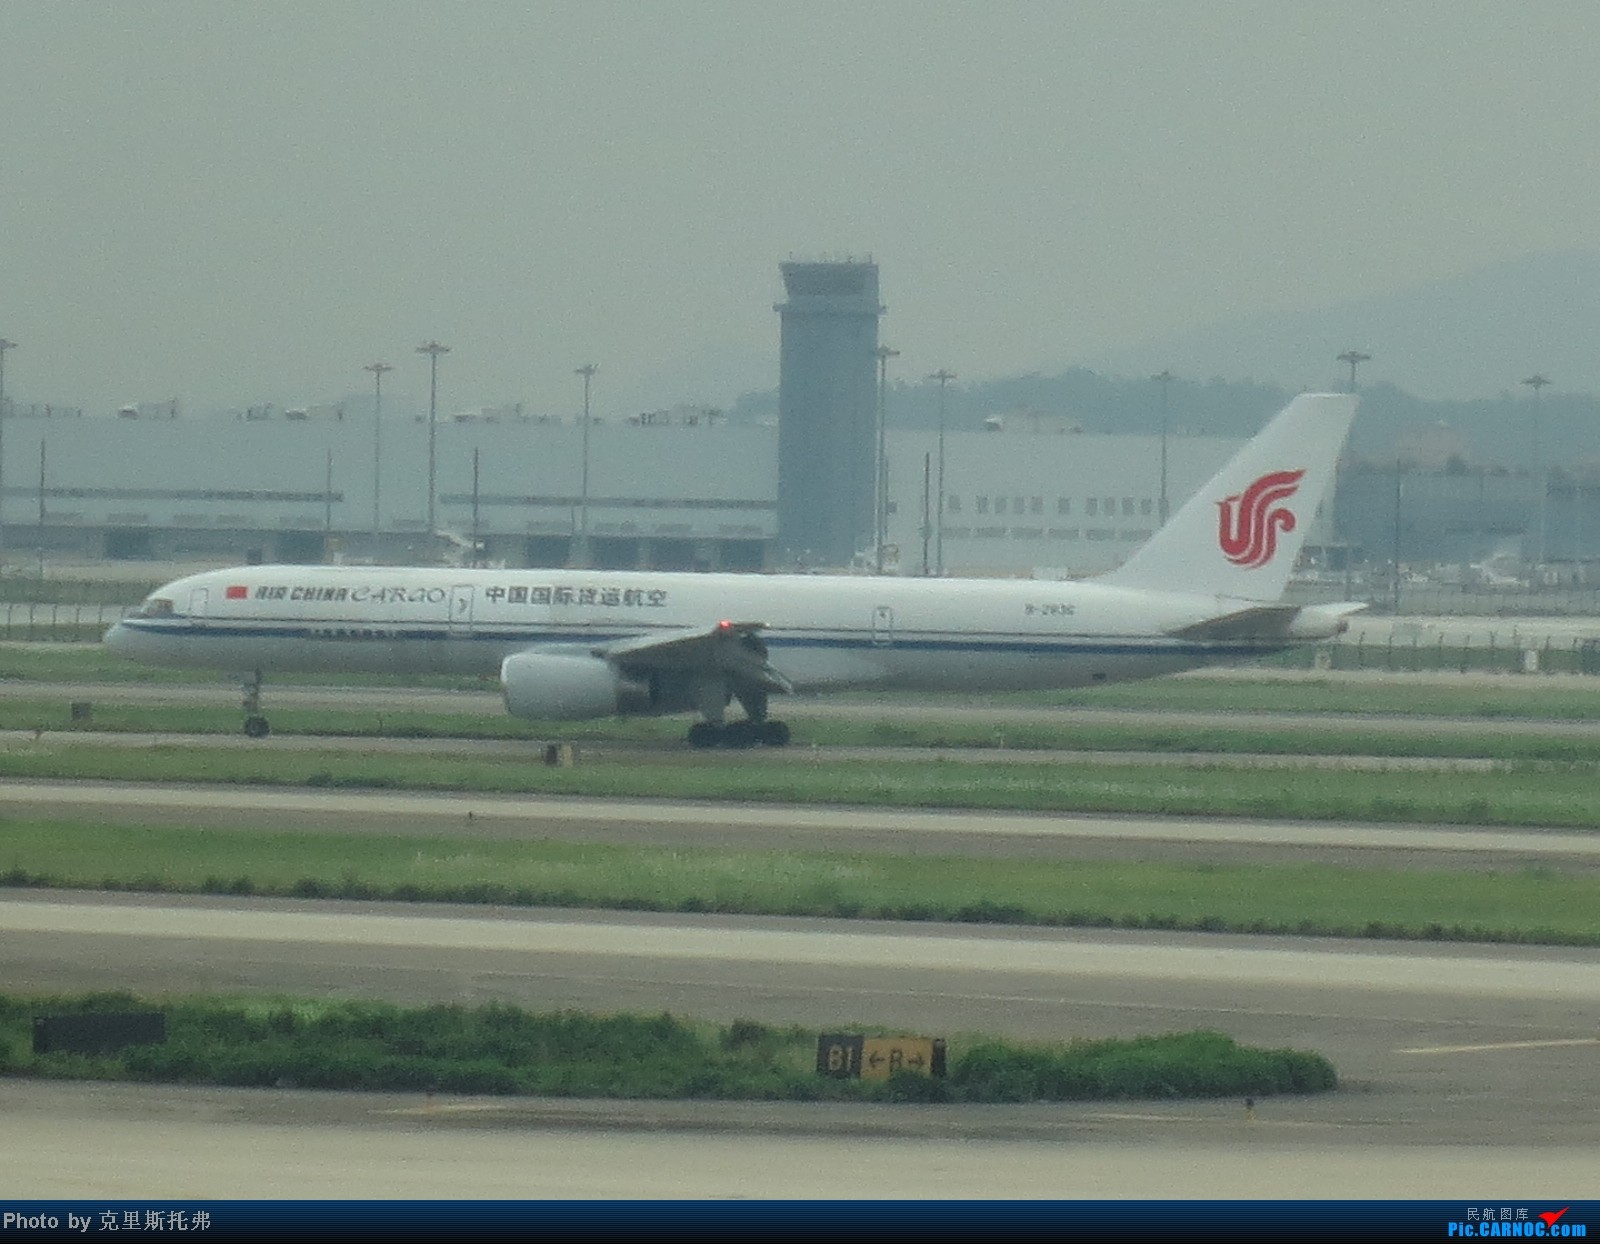 Re:[原创]【广州,你好!】八月齐鲁行 第一集 {初到齐鲁城} 不期而遇,鹏程行万里 相伴相惜,享飞行至美 757F